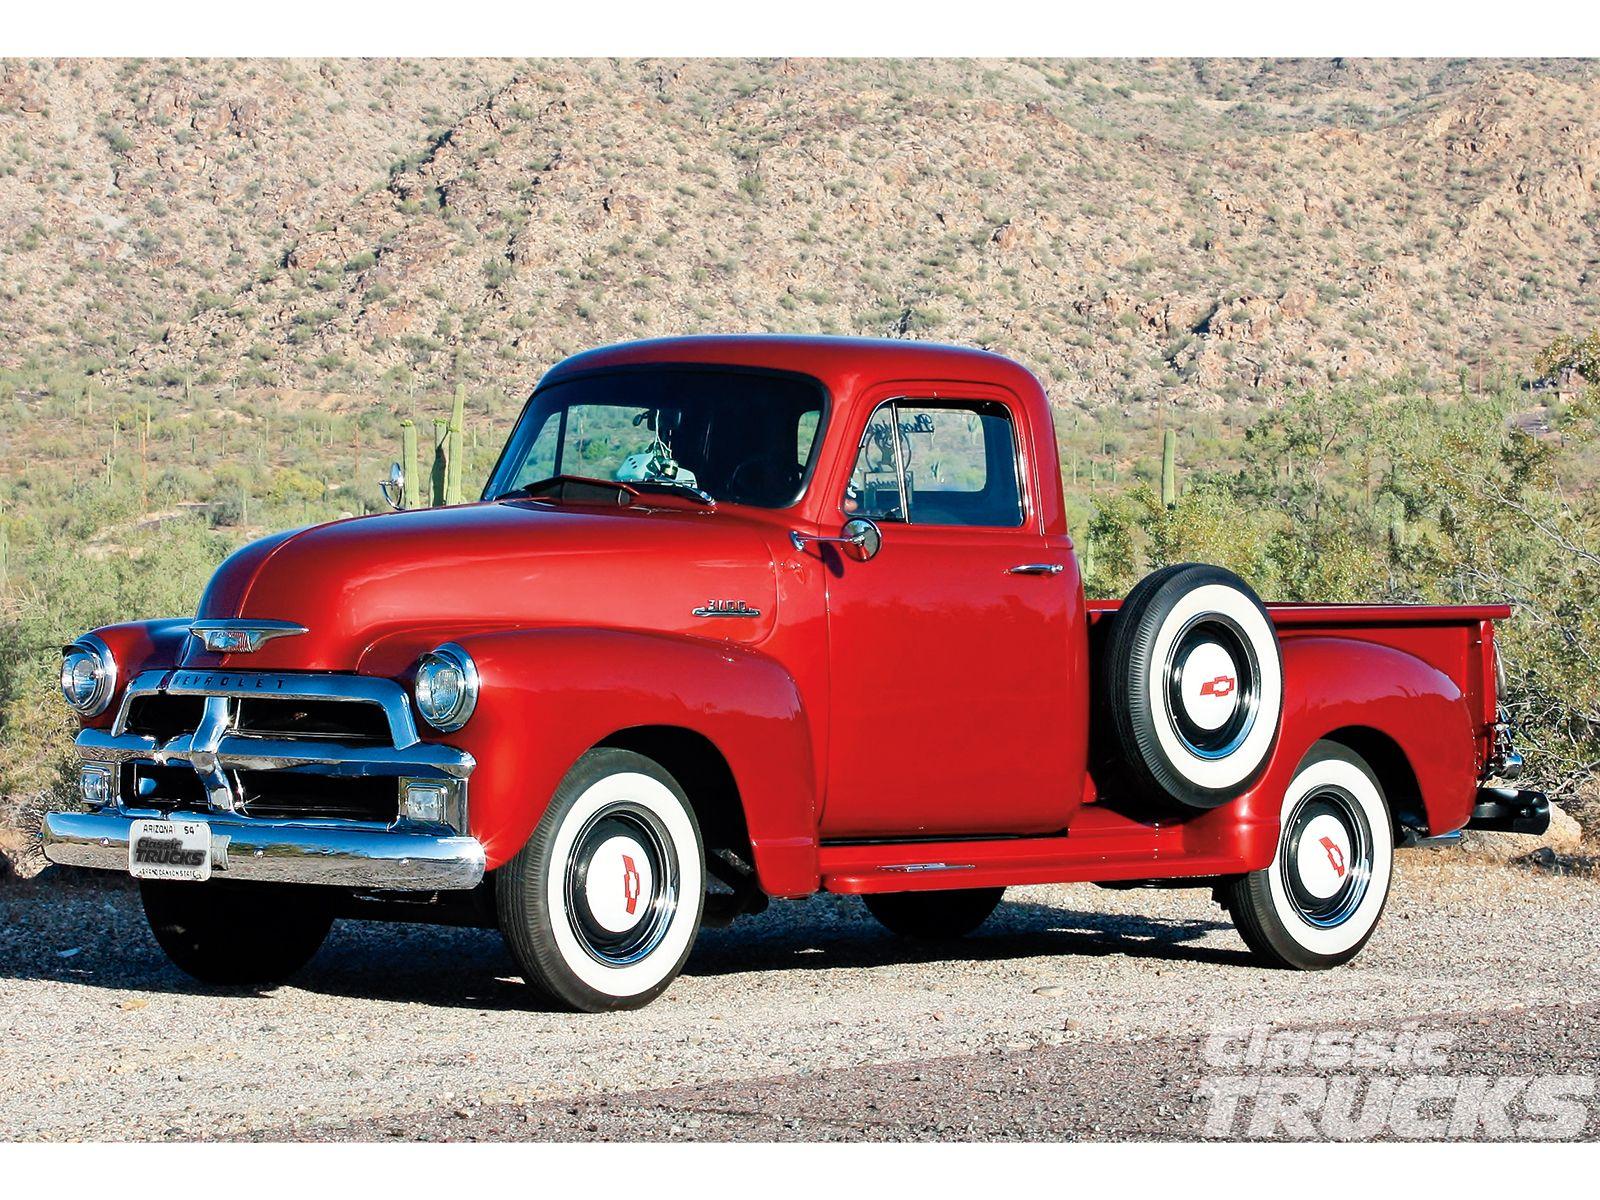 1954-chevy-3100-front-three-quarter.jpg (1600×1200)   Machines ...